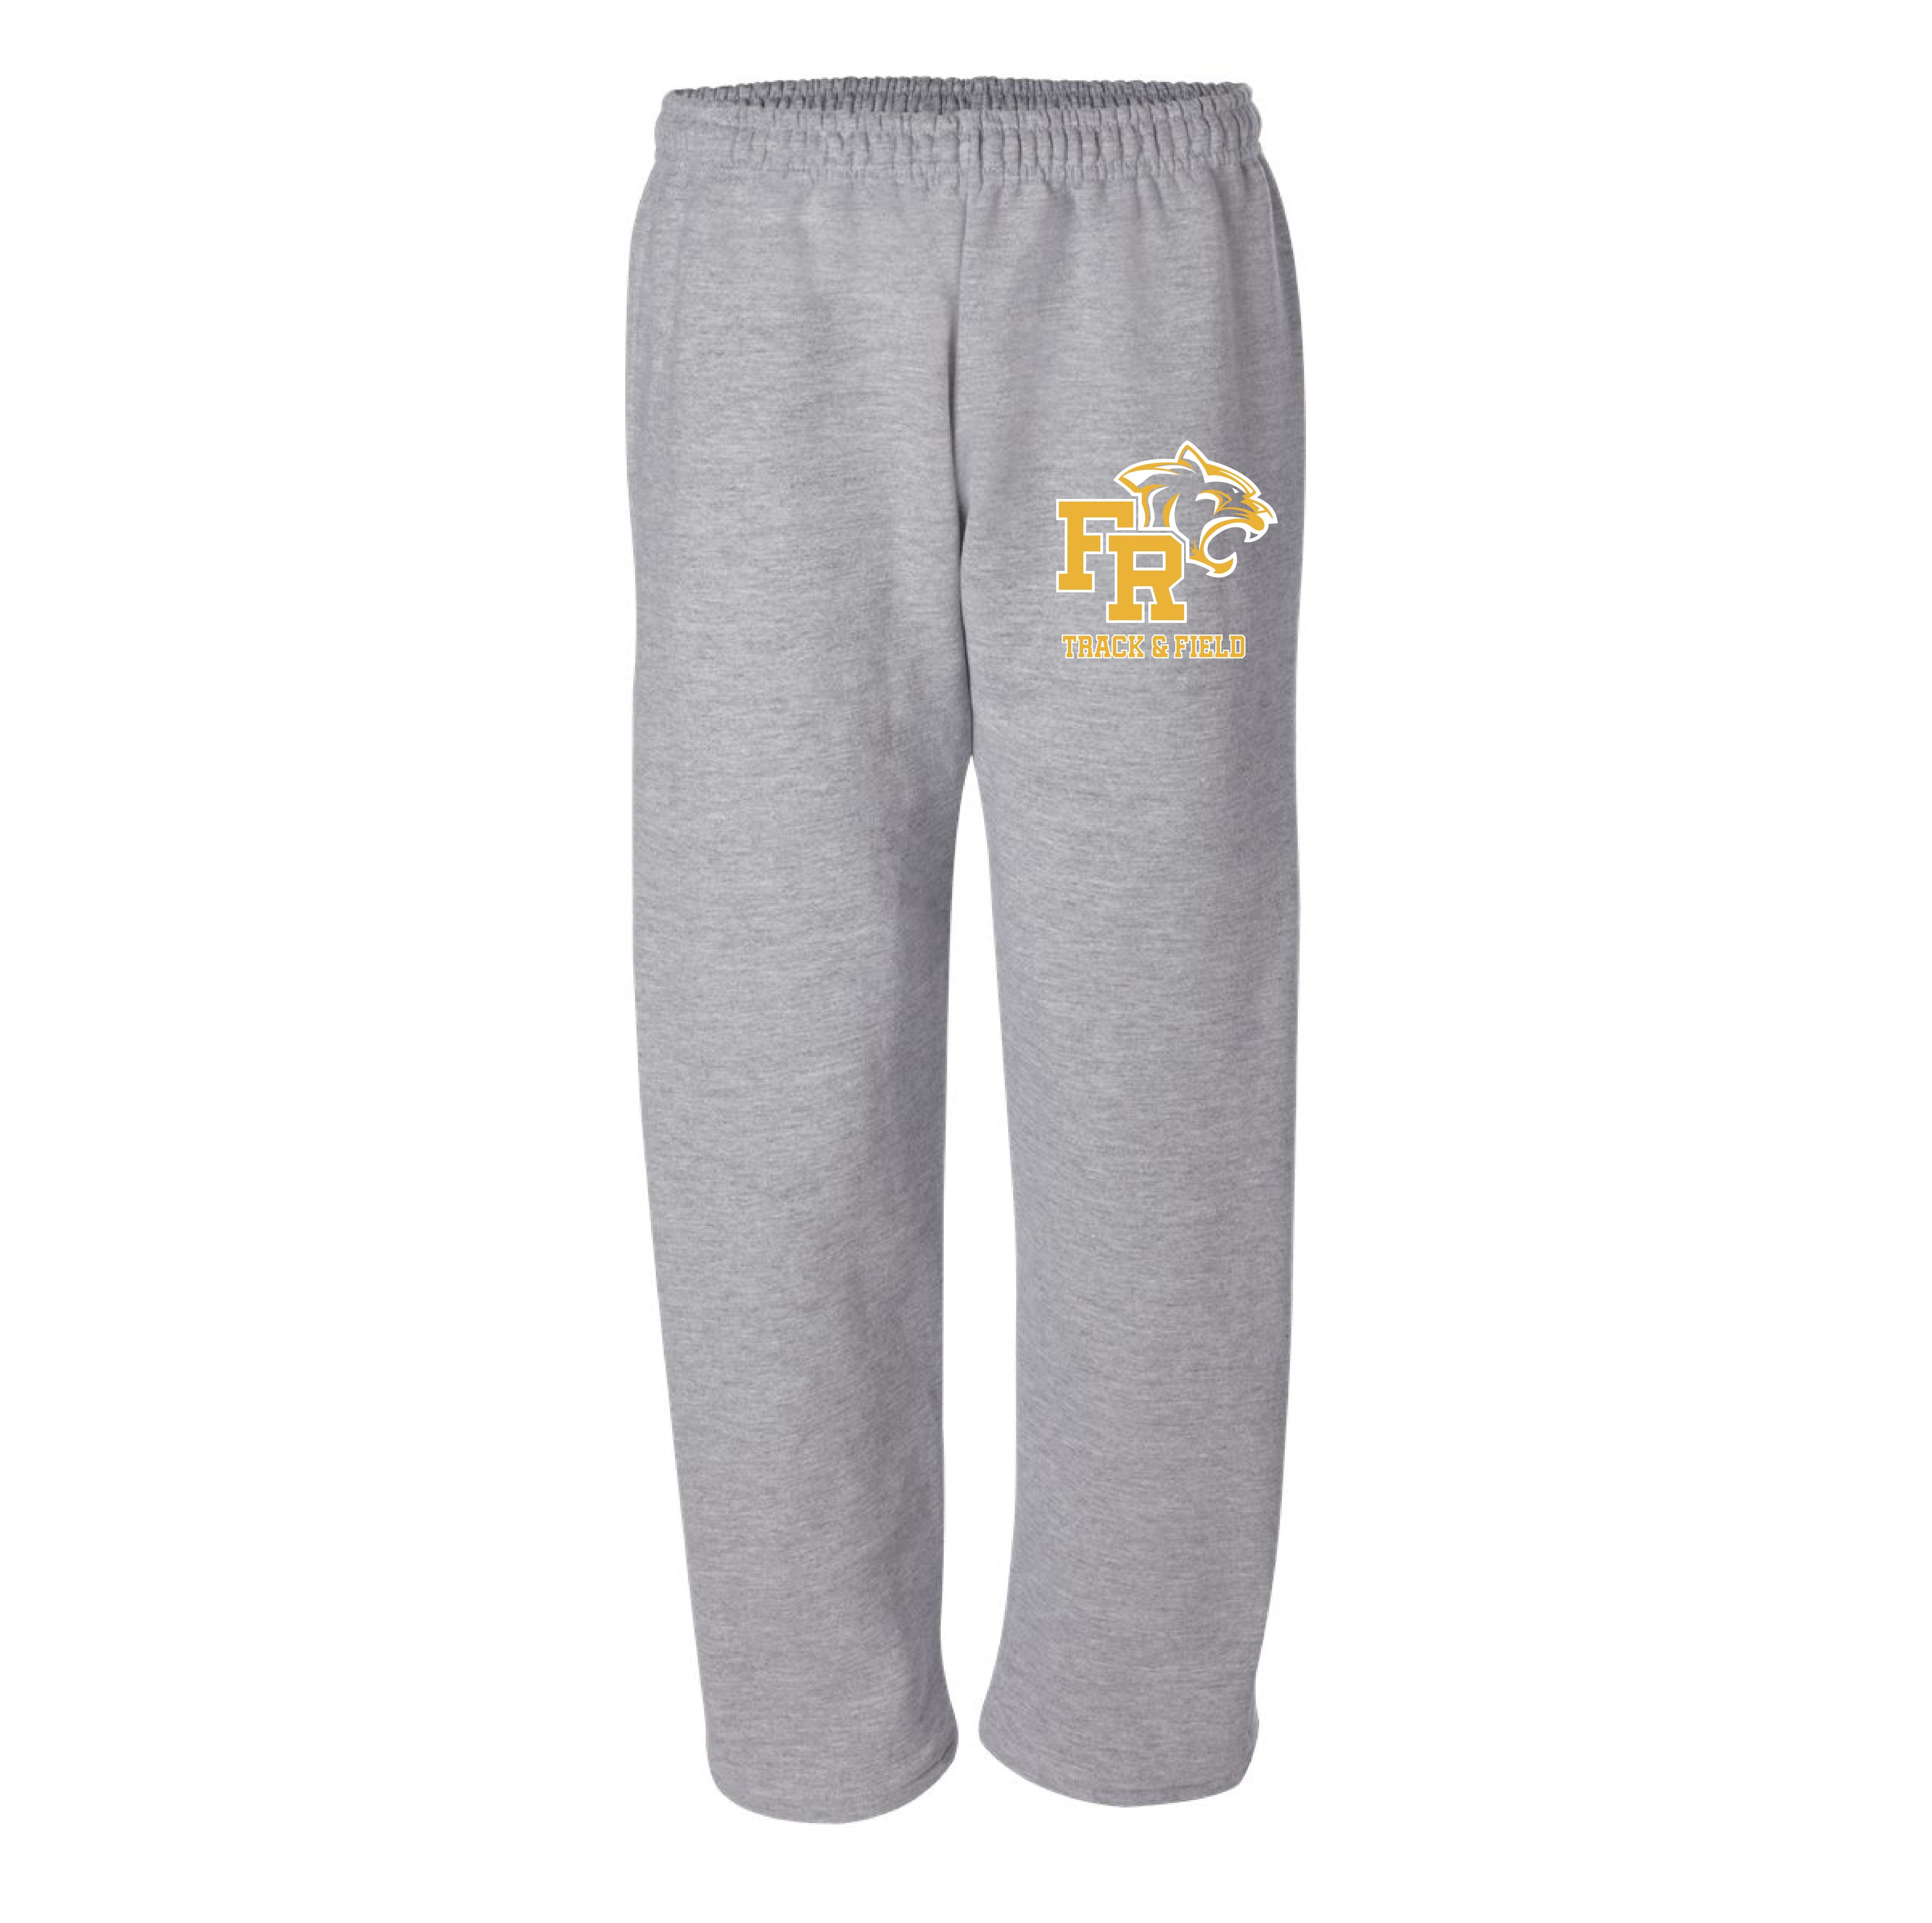 Gildan Open Bottom Sweatpants with Pockets